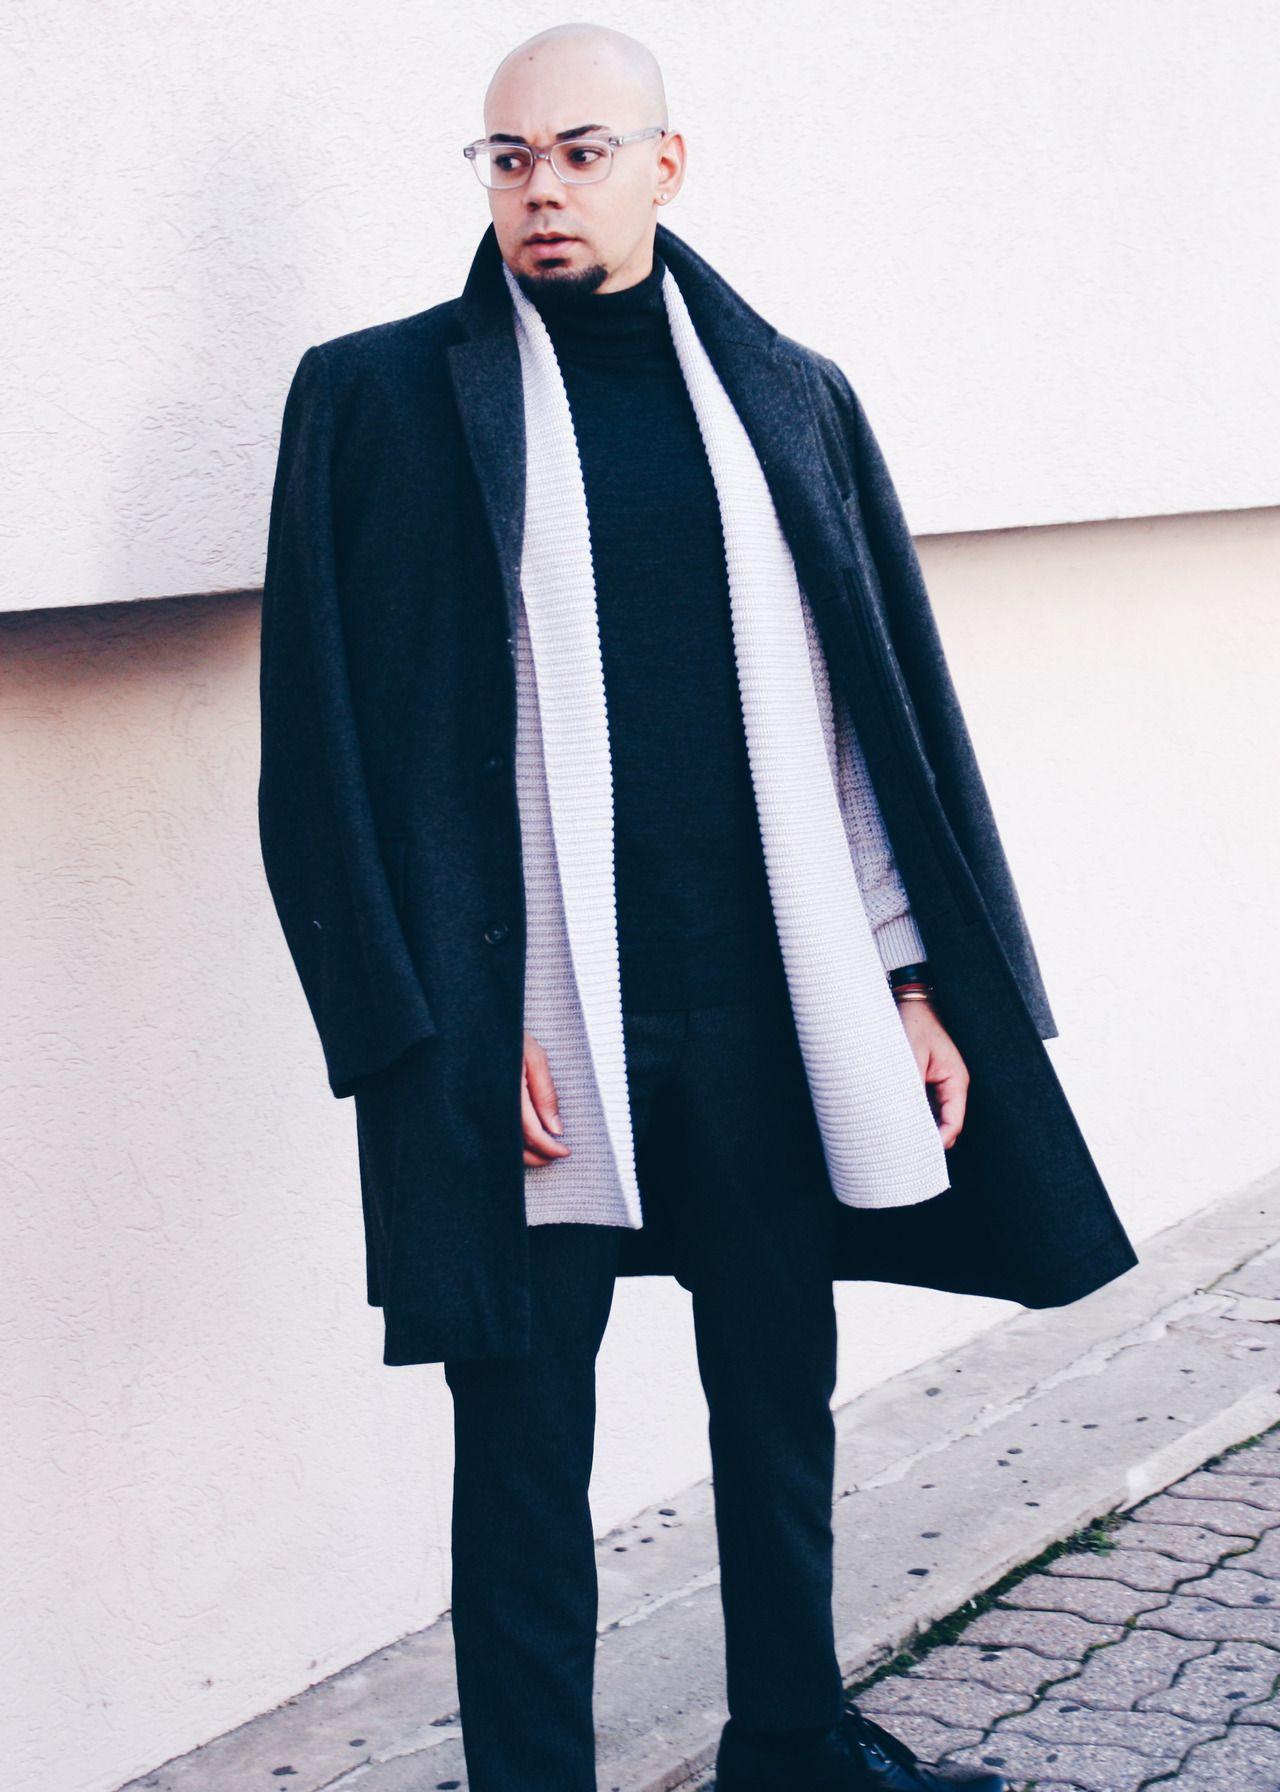 Monochromatic Grey + Oversized Overcoat Overcoat // Calvin Klein (similar) -- Cardigan // Topman -- Turtleneck // Uniqlo -- Pants // H&M -- Shoes // Steve Madden